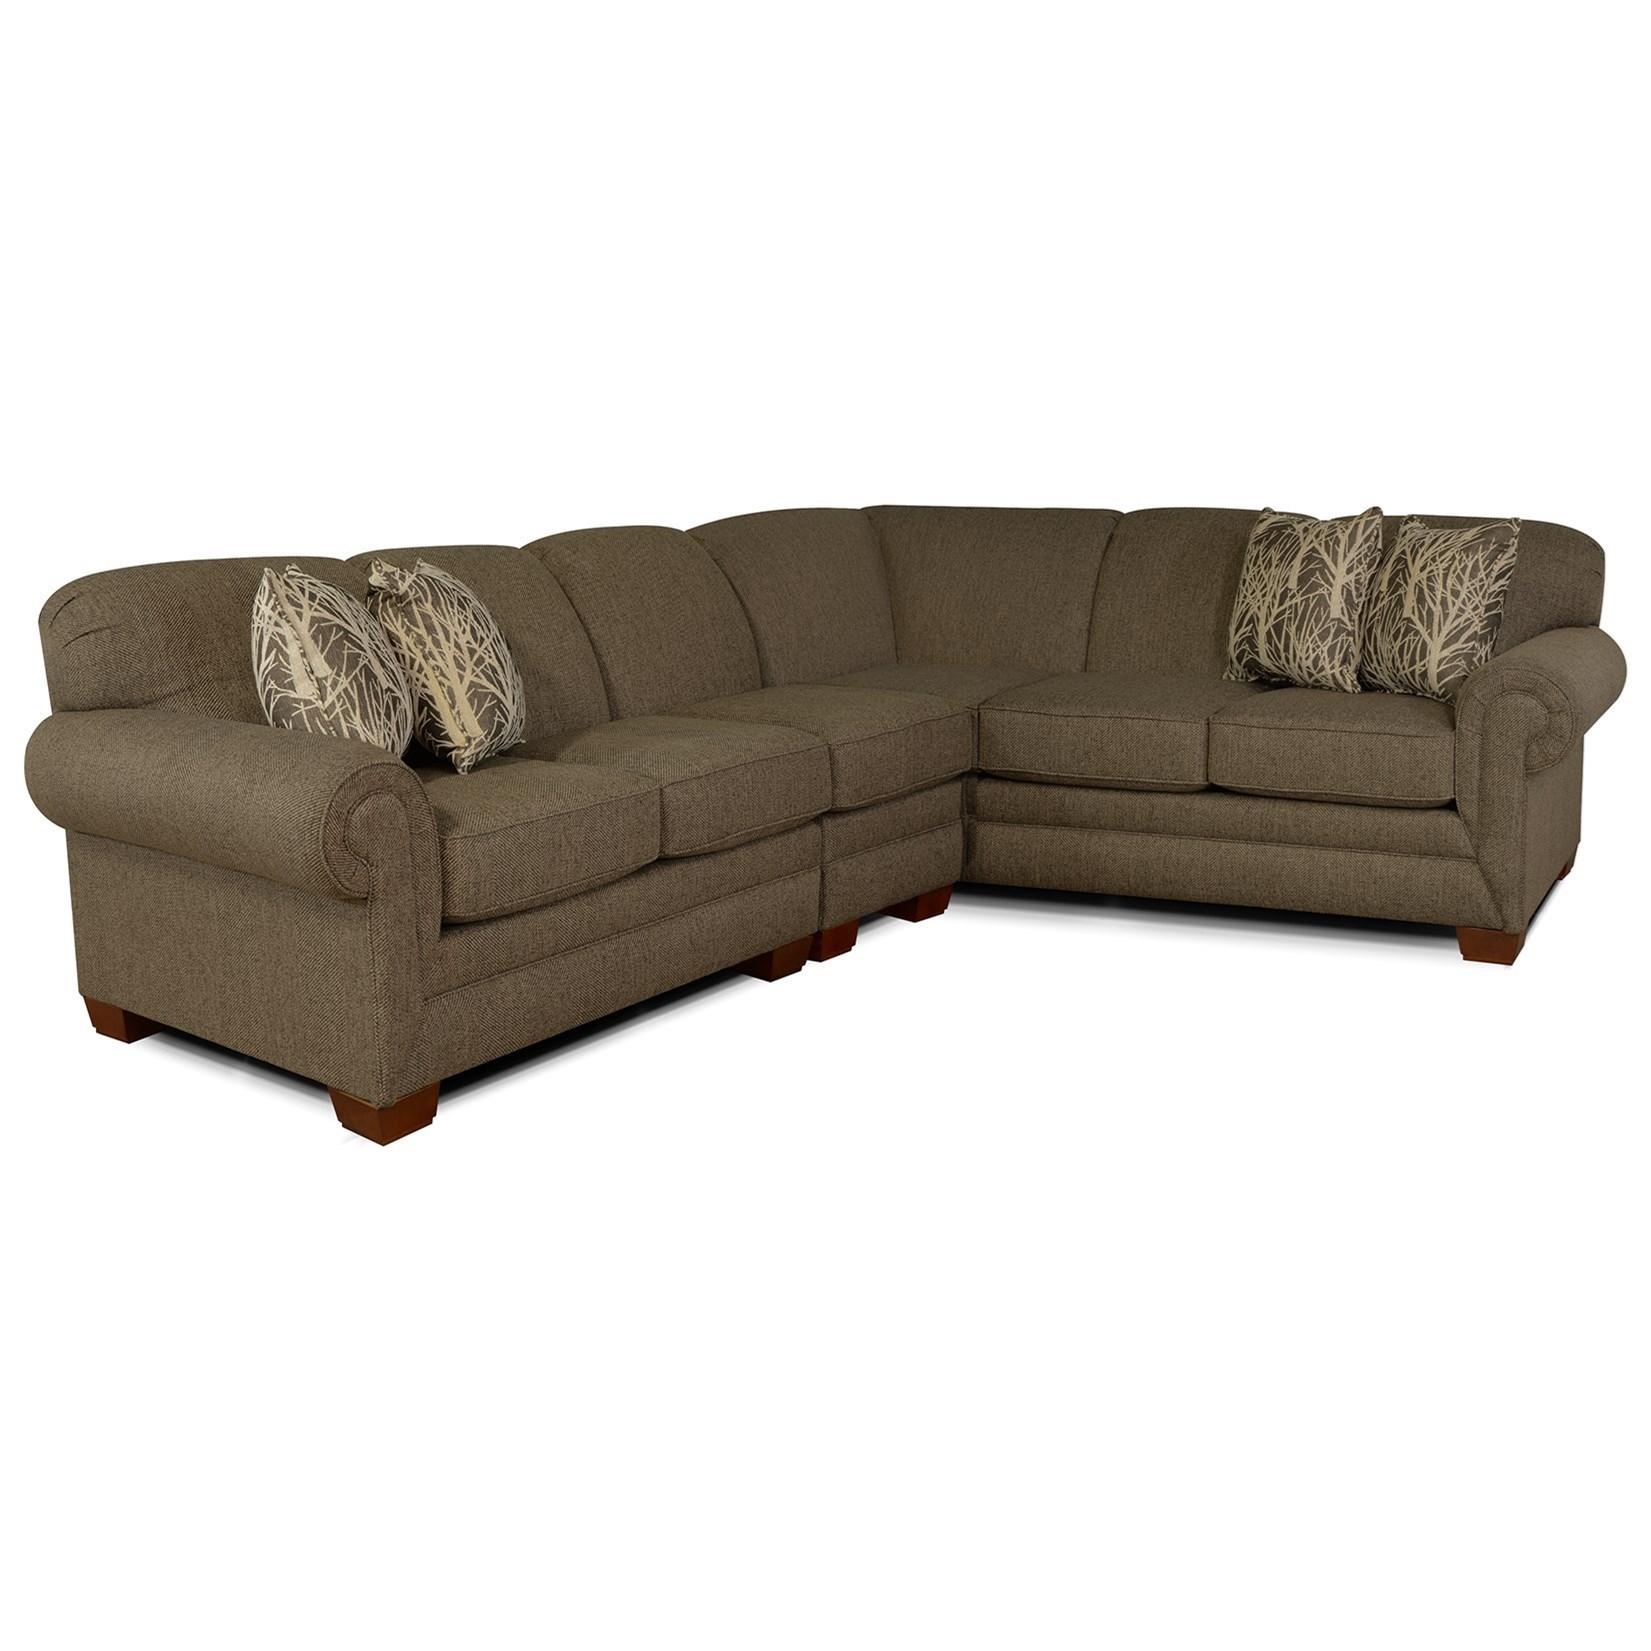 3pc Sectional Sofa